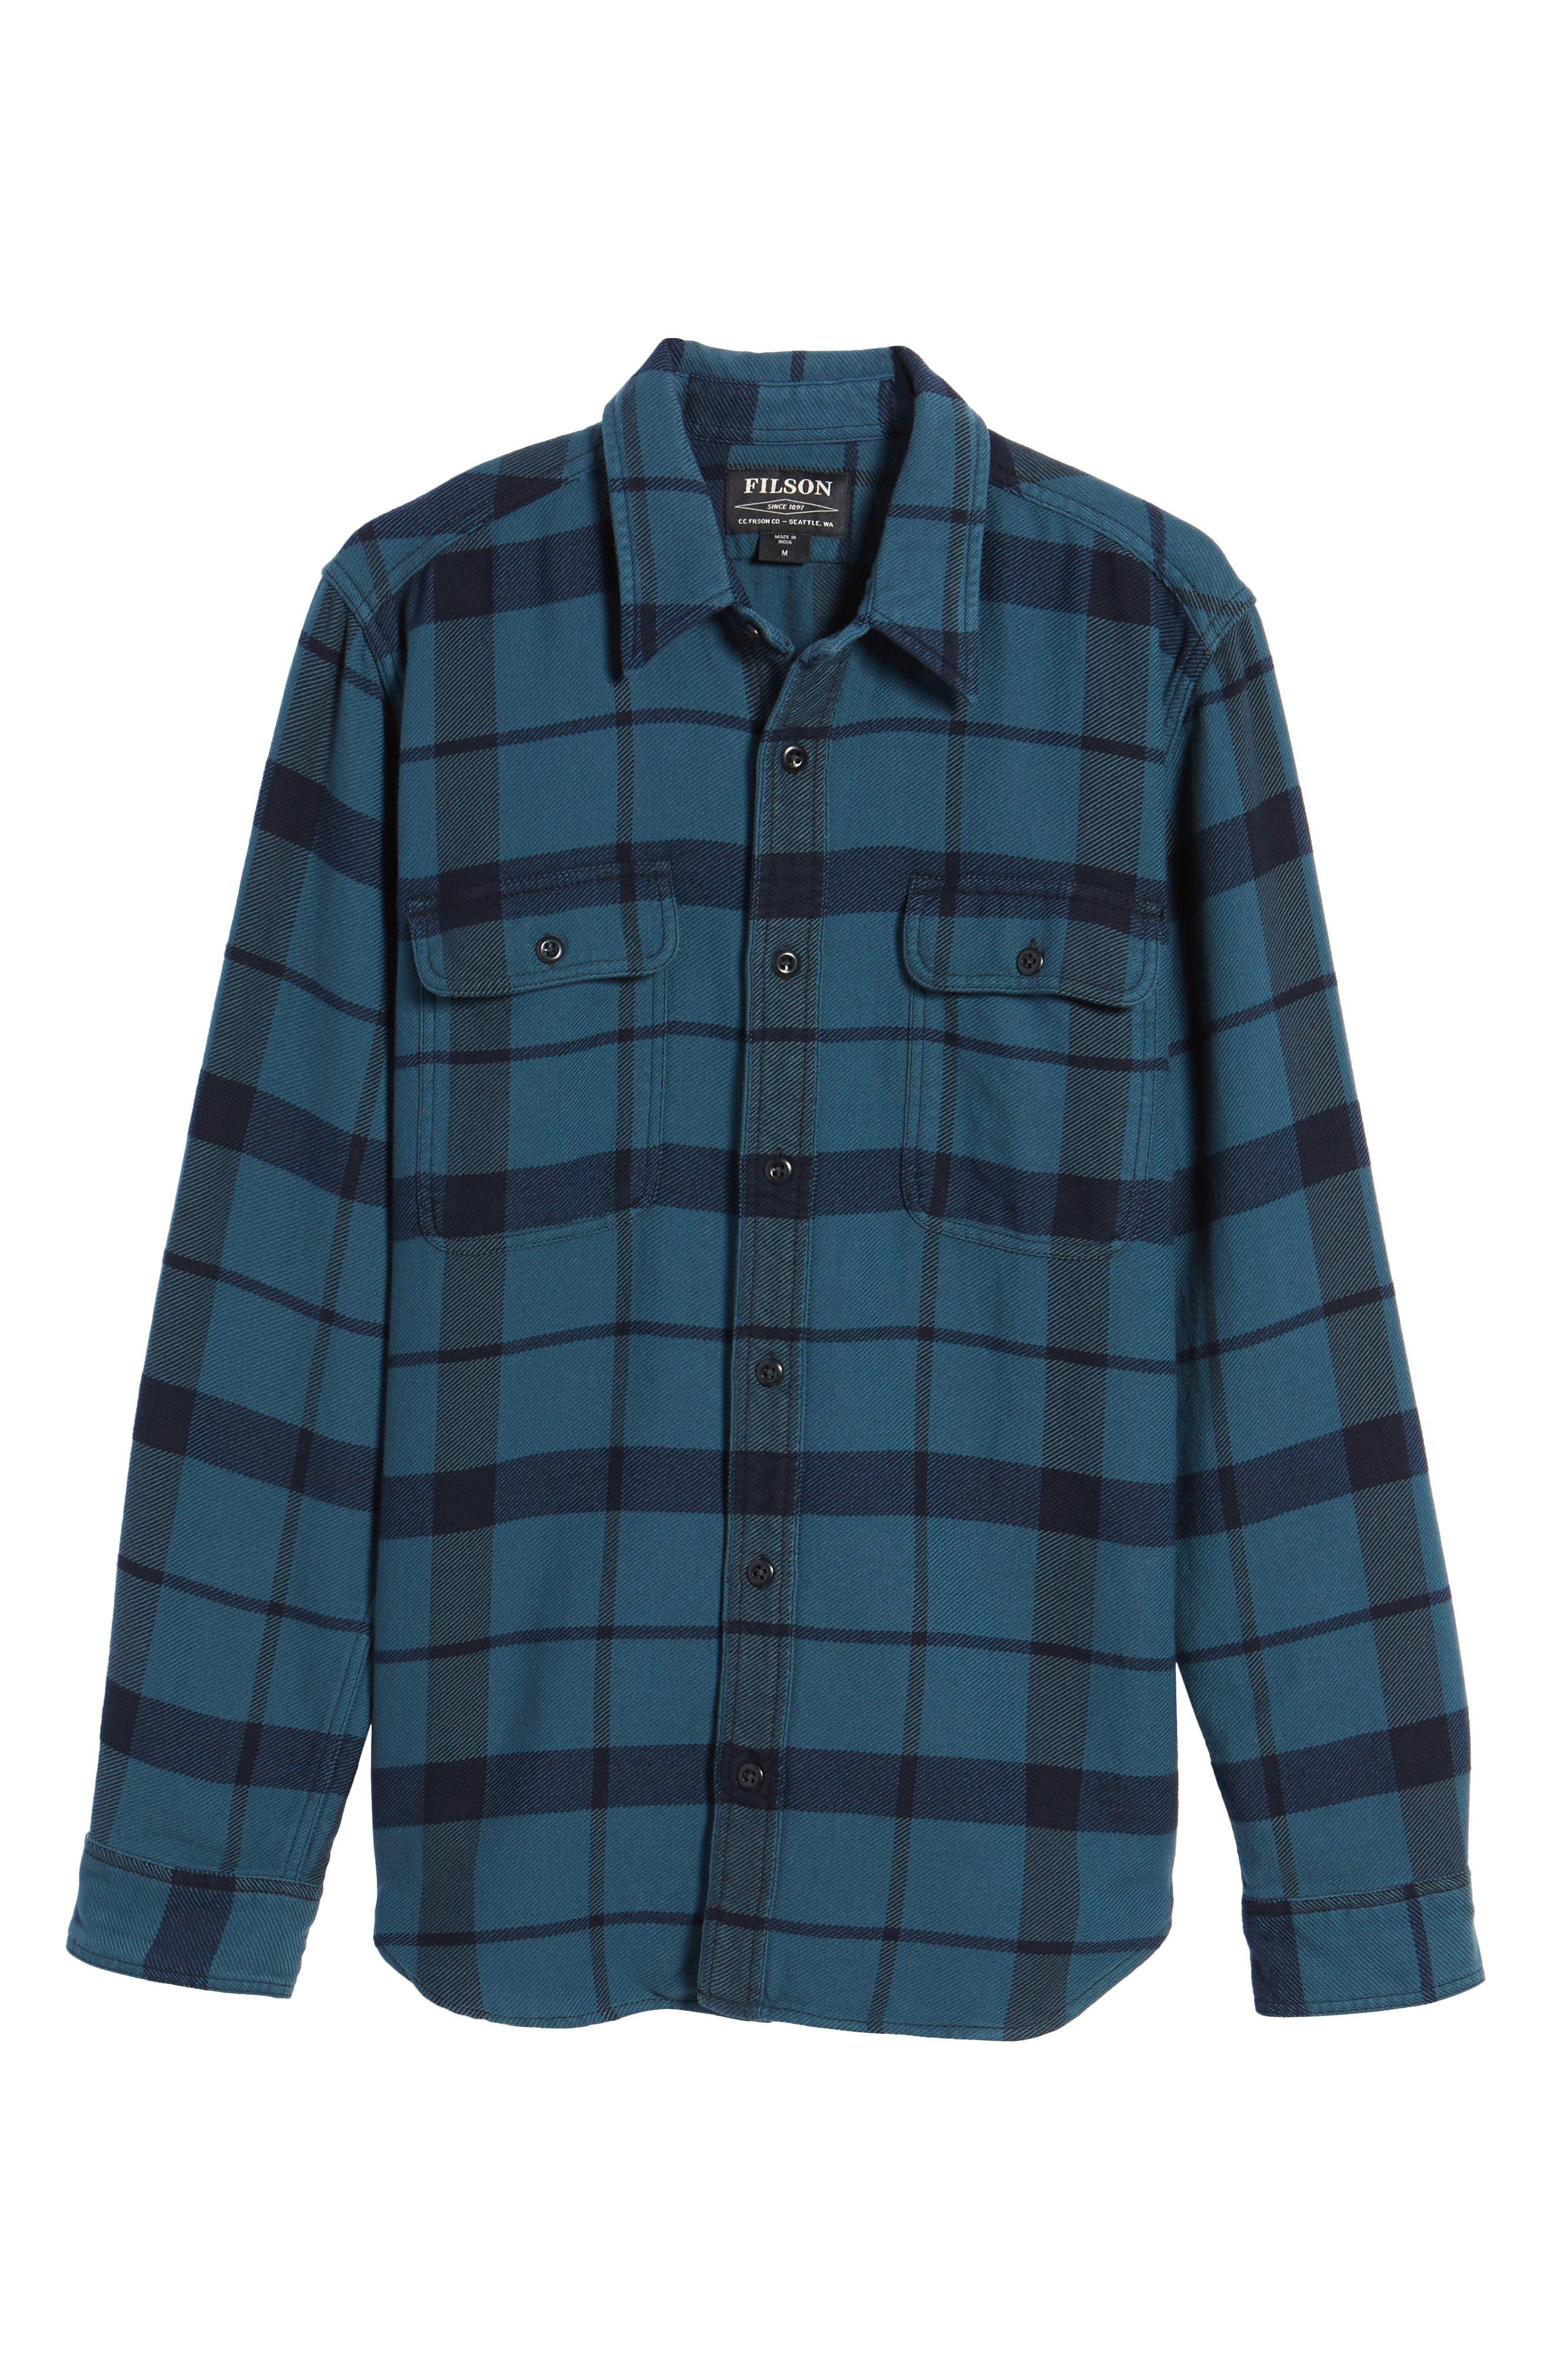 'Vintage Flannel' Regular Fit Plaid Cotton Shirt,                             Alternate thumbnail 11, color,                             Brown/ Navy